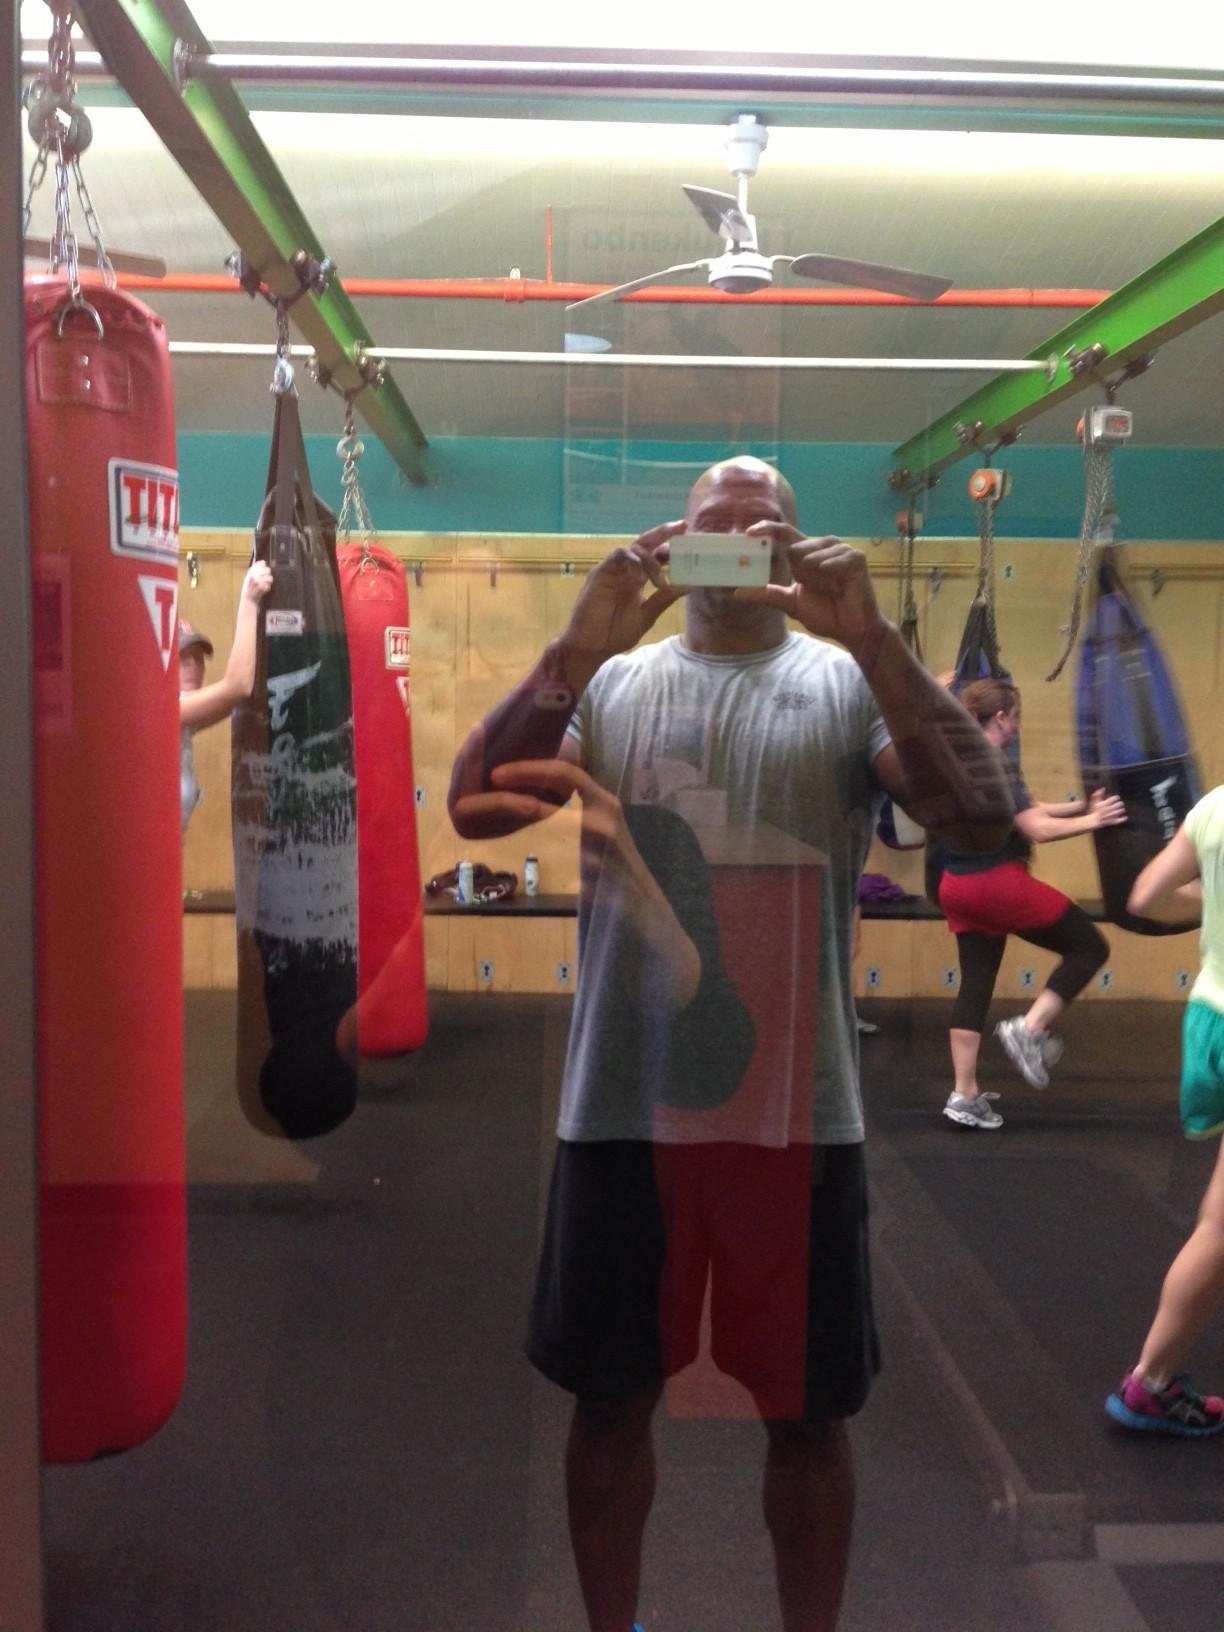 Robert leading the Cardio Kickbox class